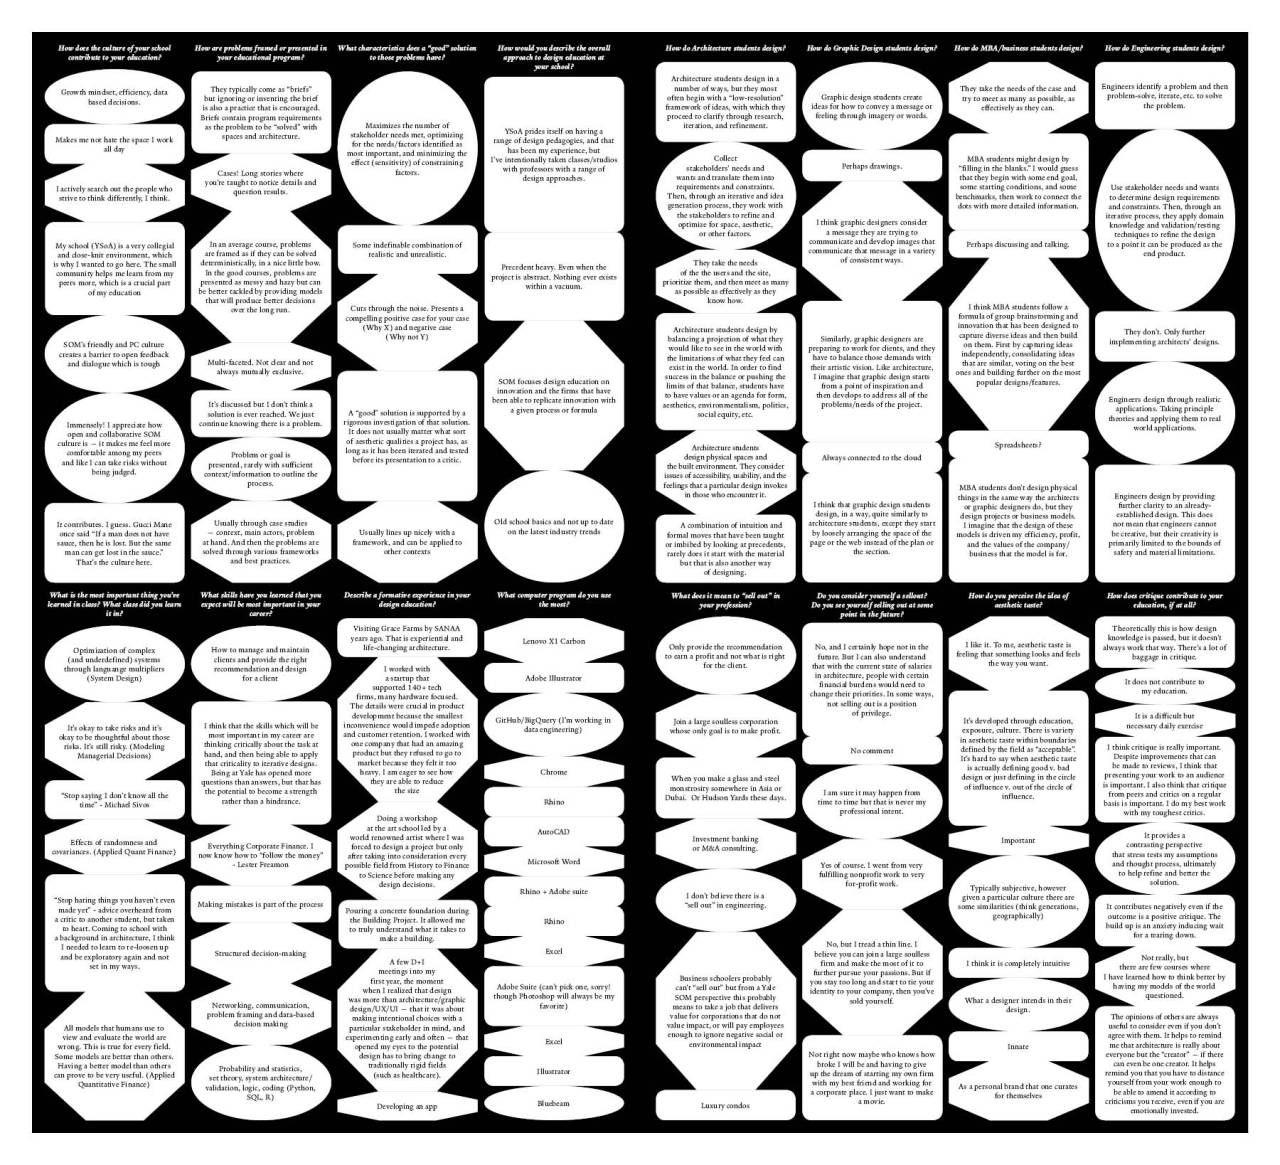 Yalegraphicdesign Paprika Vol 5 Issue 12 Design Education Design Kyla Arsadjaja Mfa 2020 And M Graphic Design Cover Art Design Graphic Design Posters